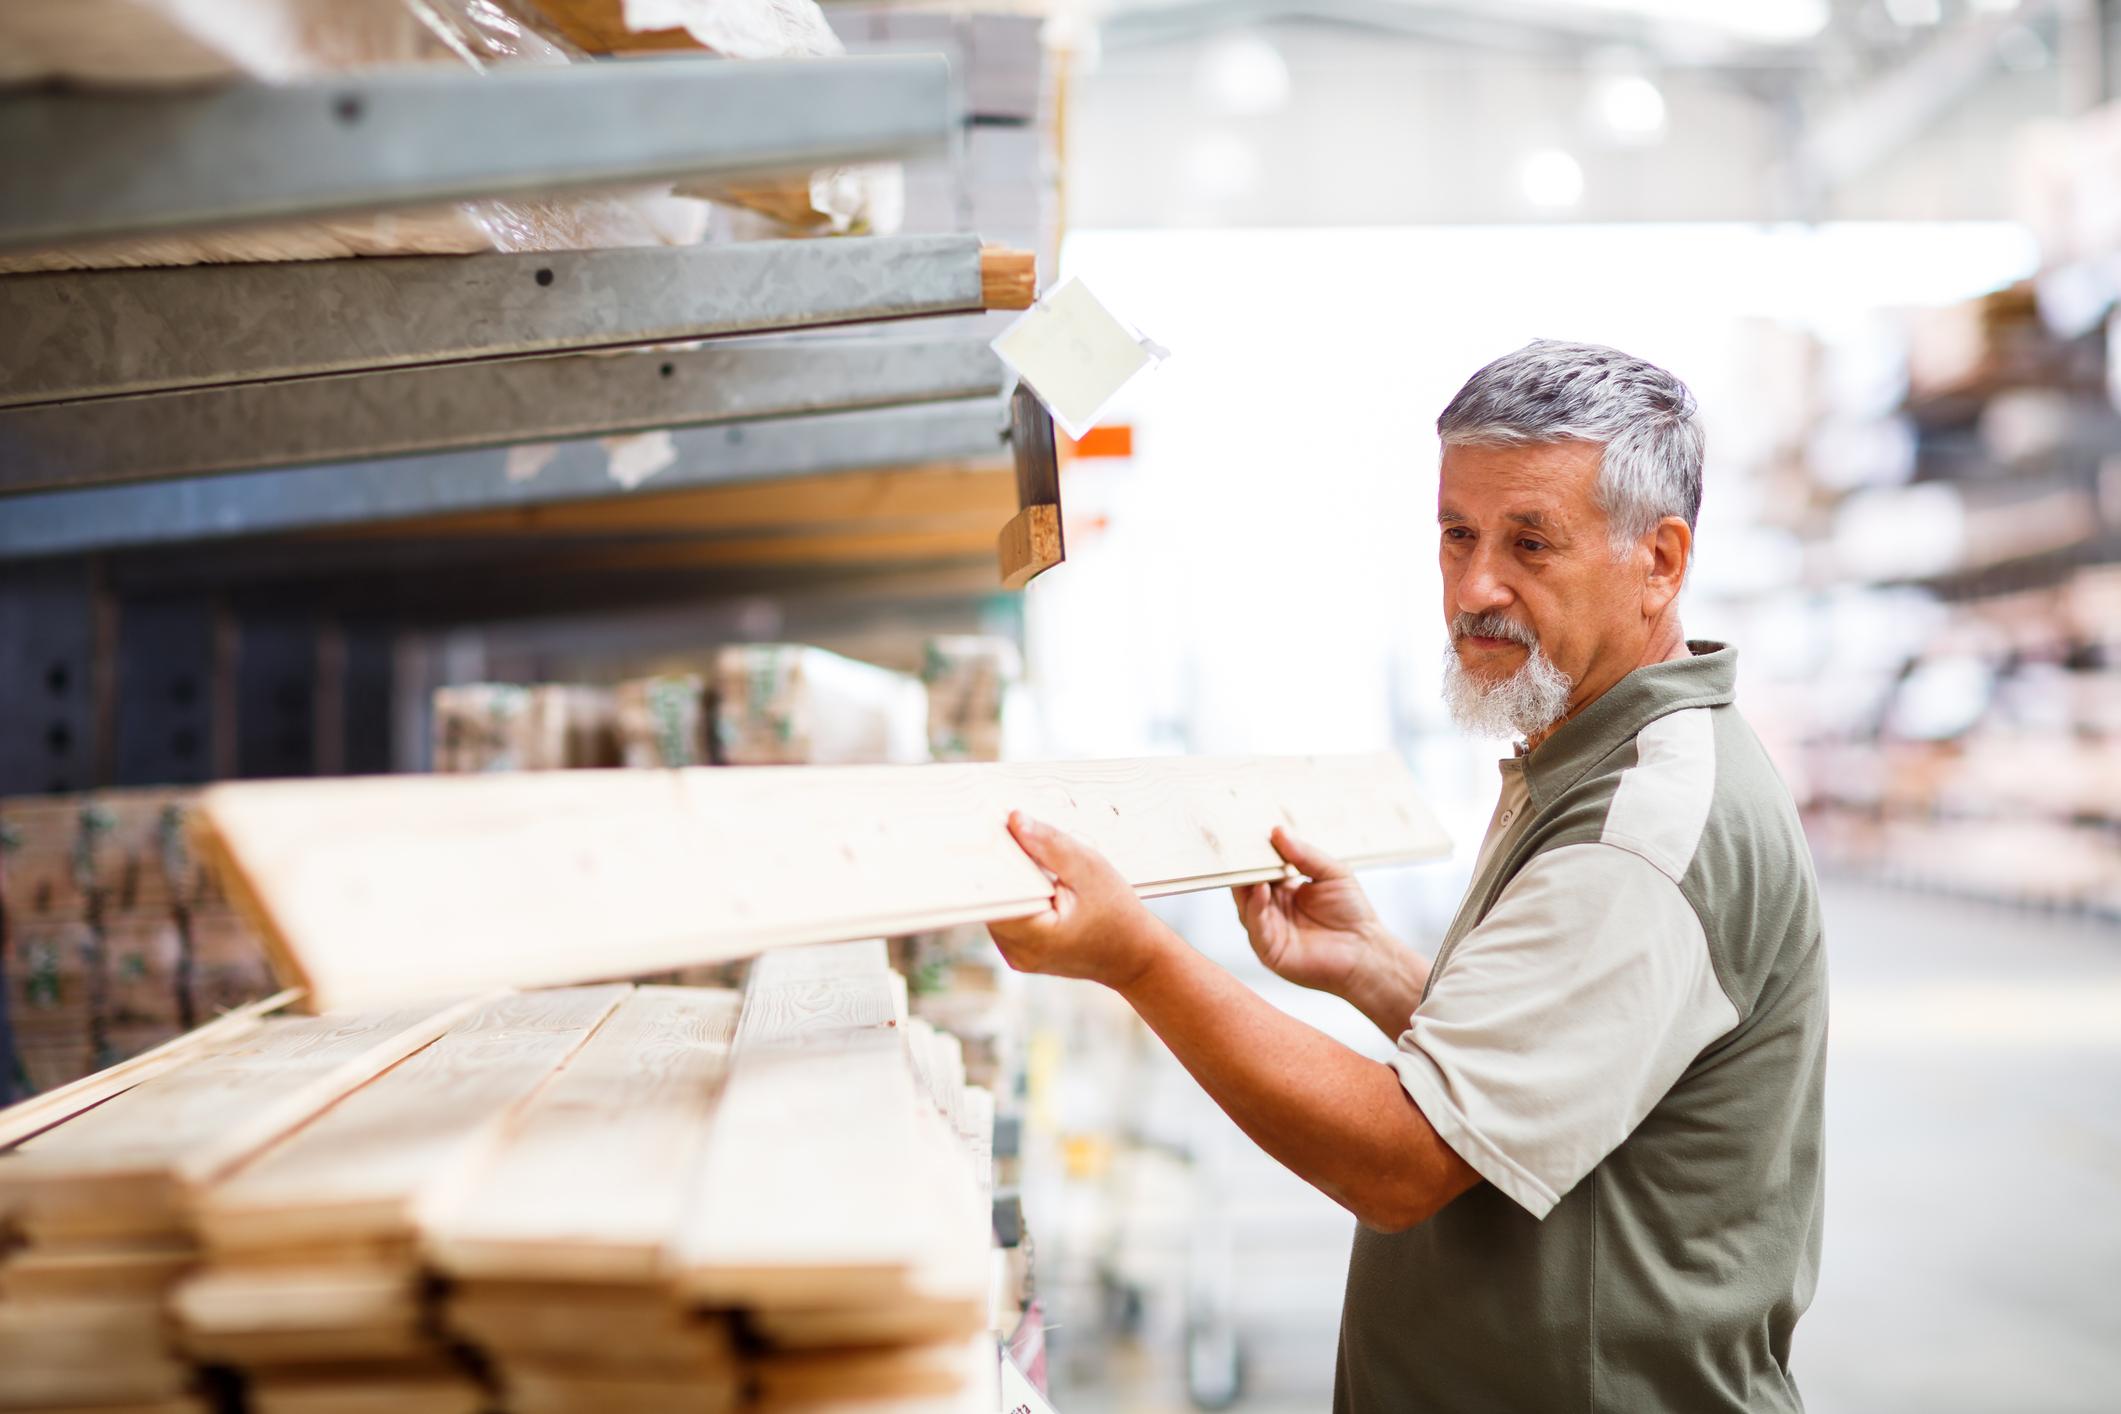 A male shopper inspects lumber at a home-improvement center.